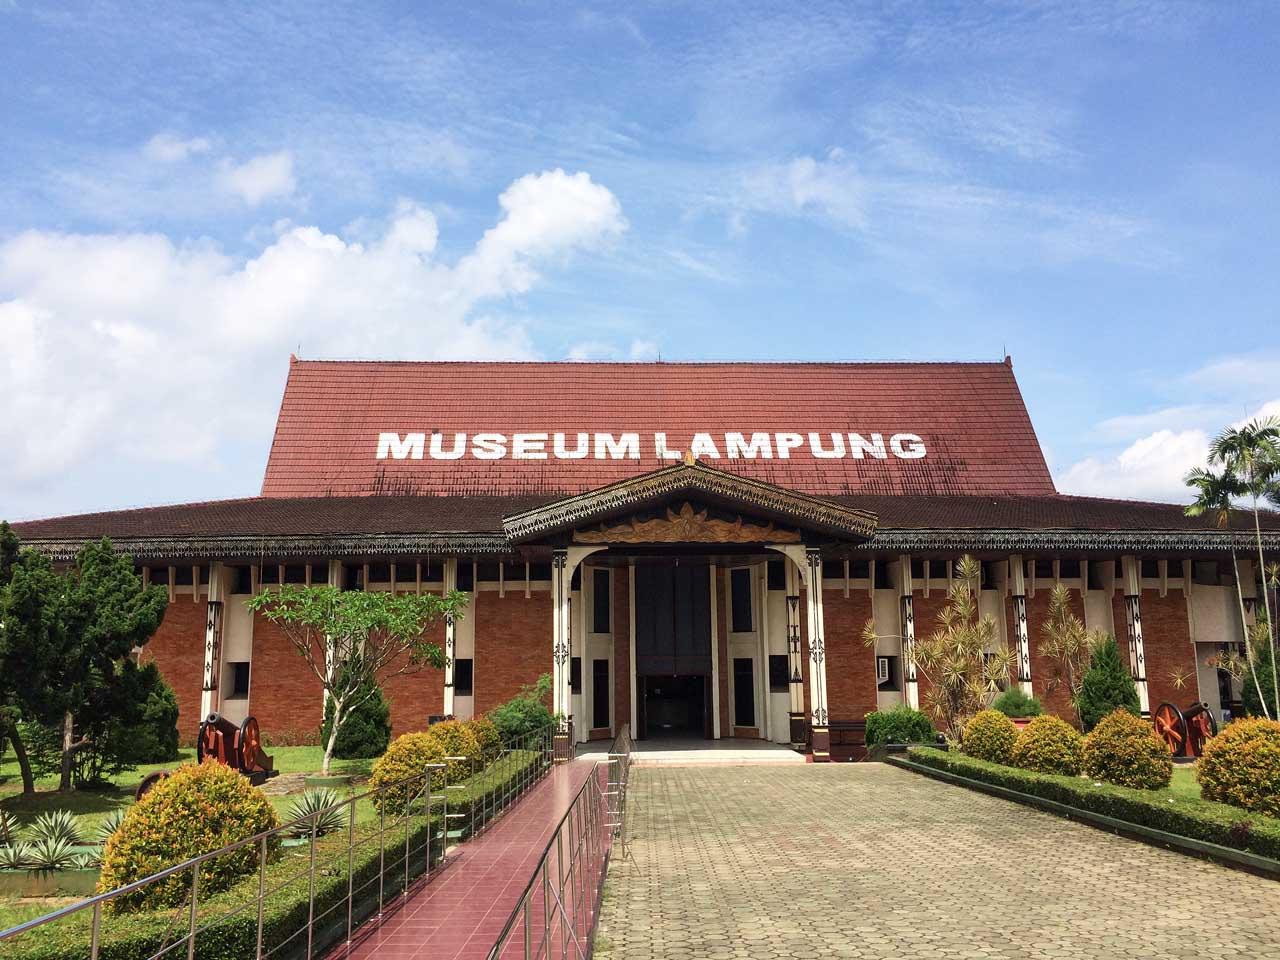 Koleksi Museum Lampung - Yopie Pangkey - 2 - hasil foto iphone 5s